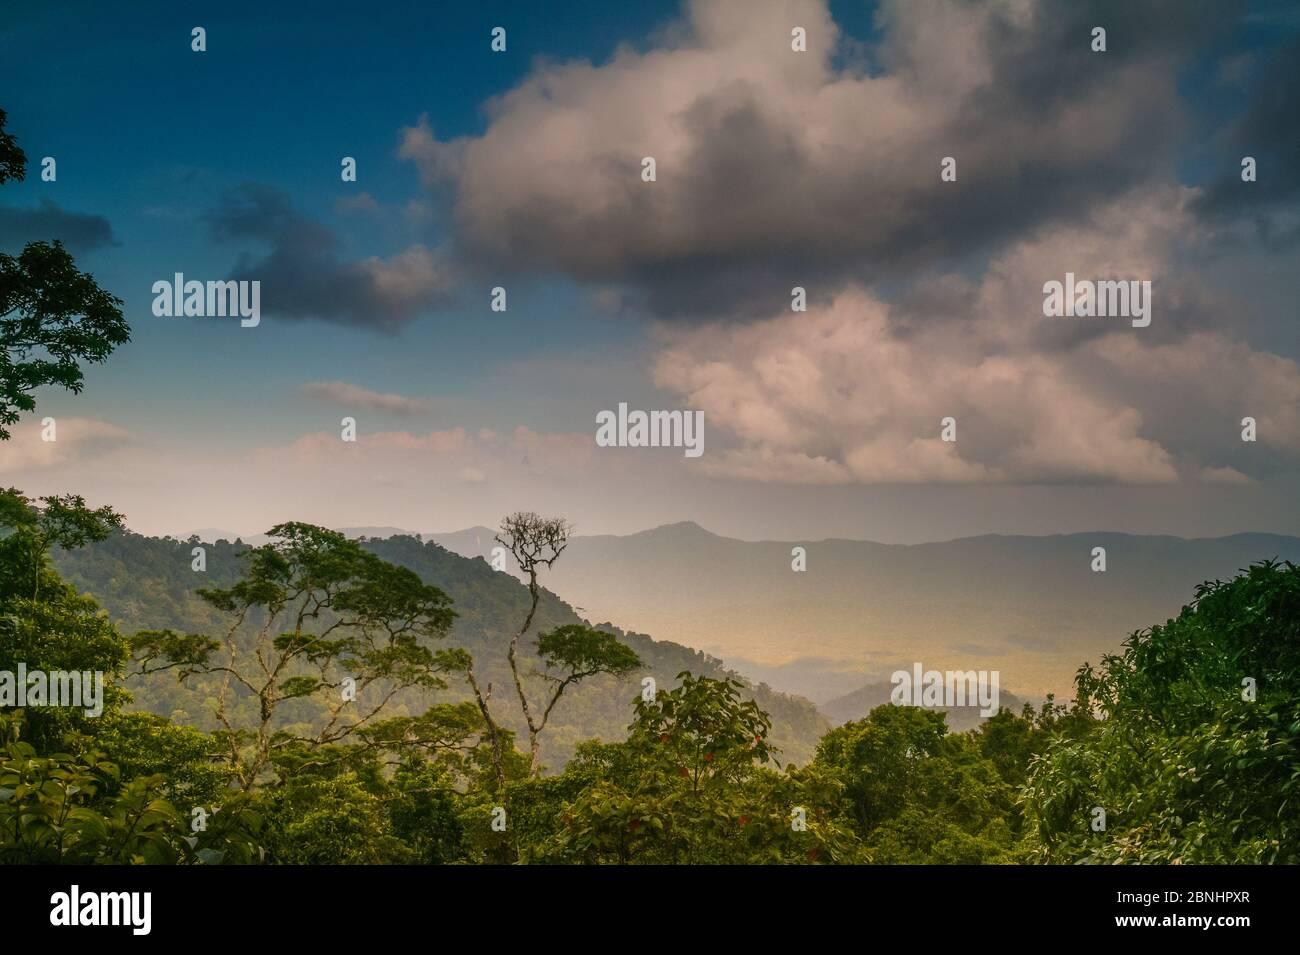 Evening light in the lush rainforest at Cerro Pirre, Darien national park, Darien province, Republic of Panama Stock Photo